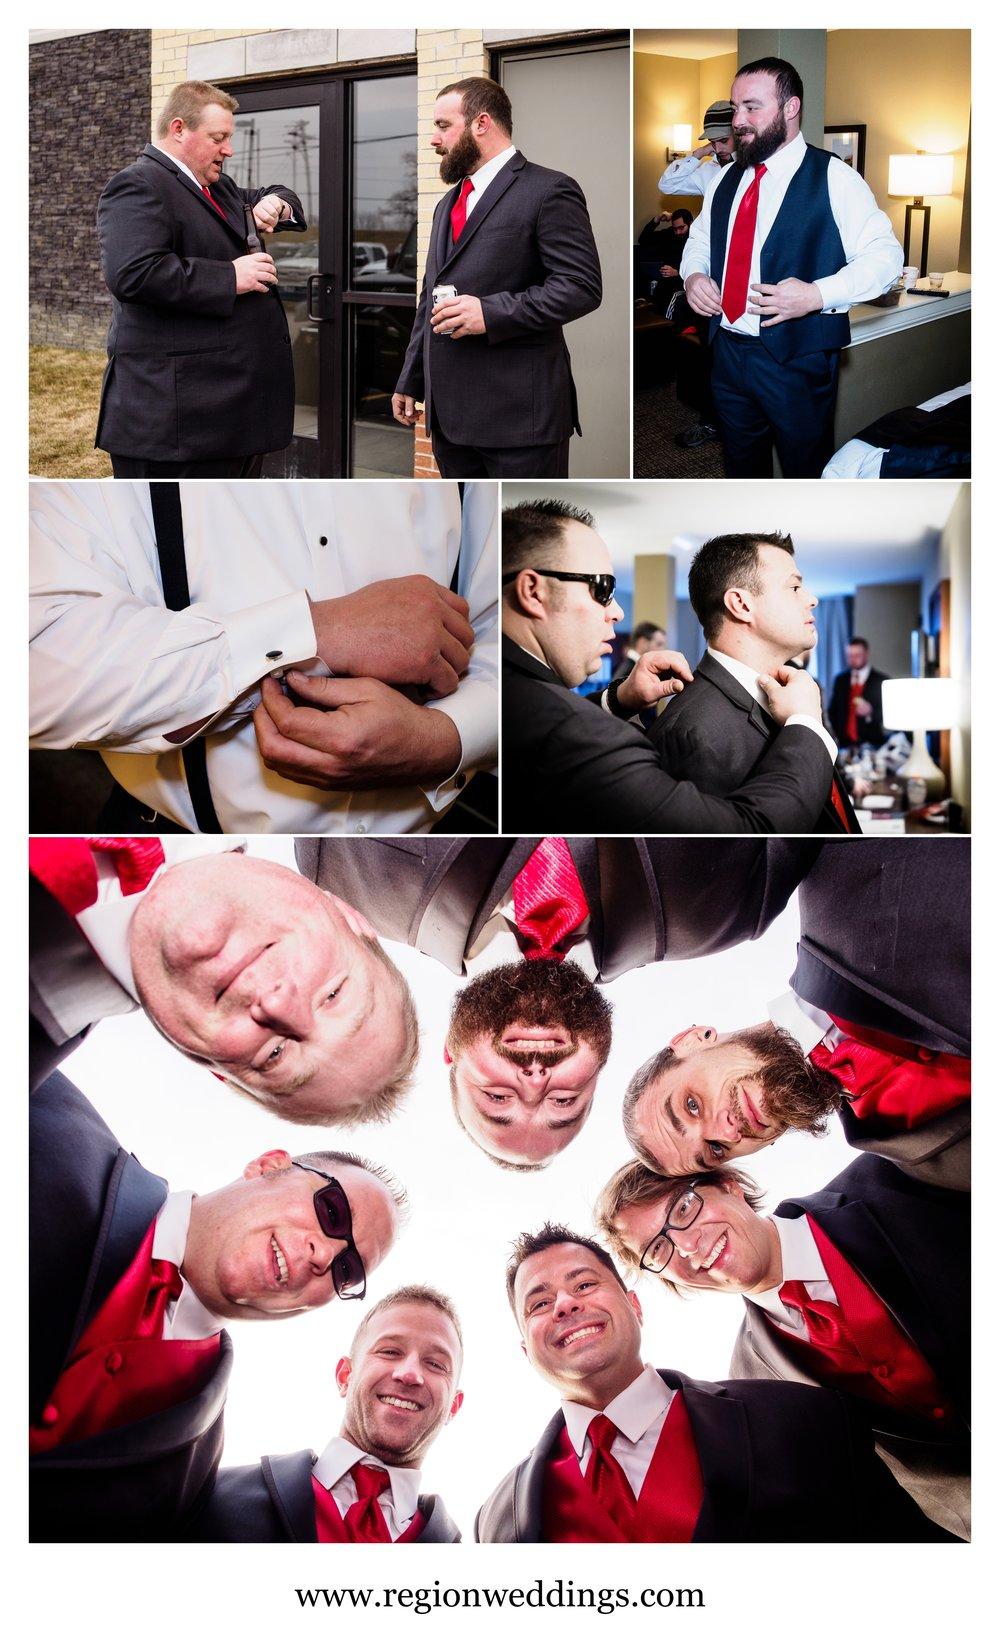 The groomsmen prep for the big day at Fair Oaks Farmhouse.